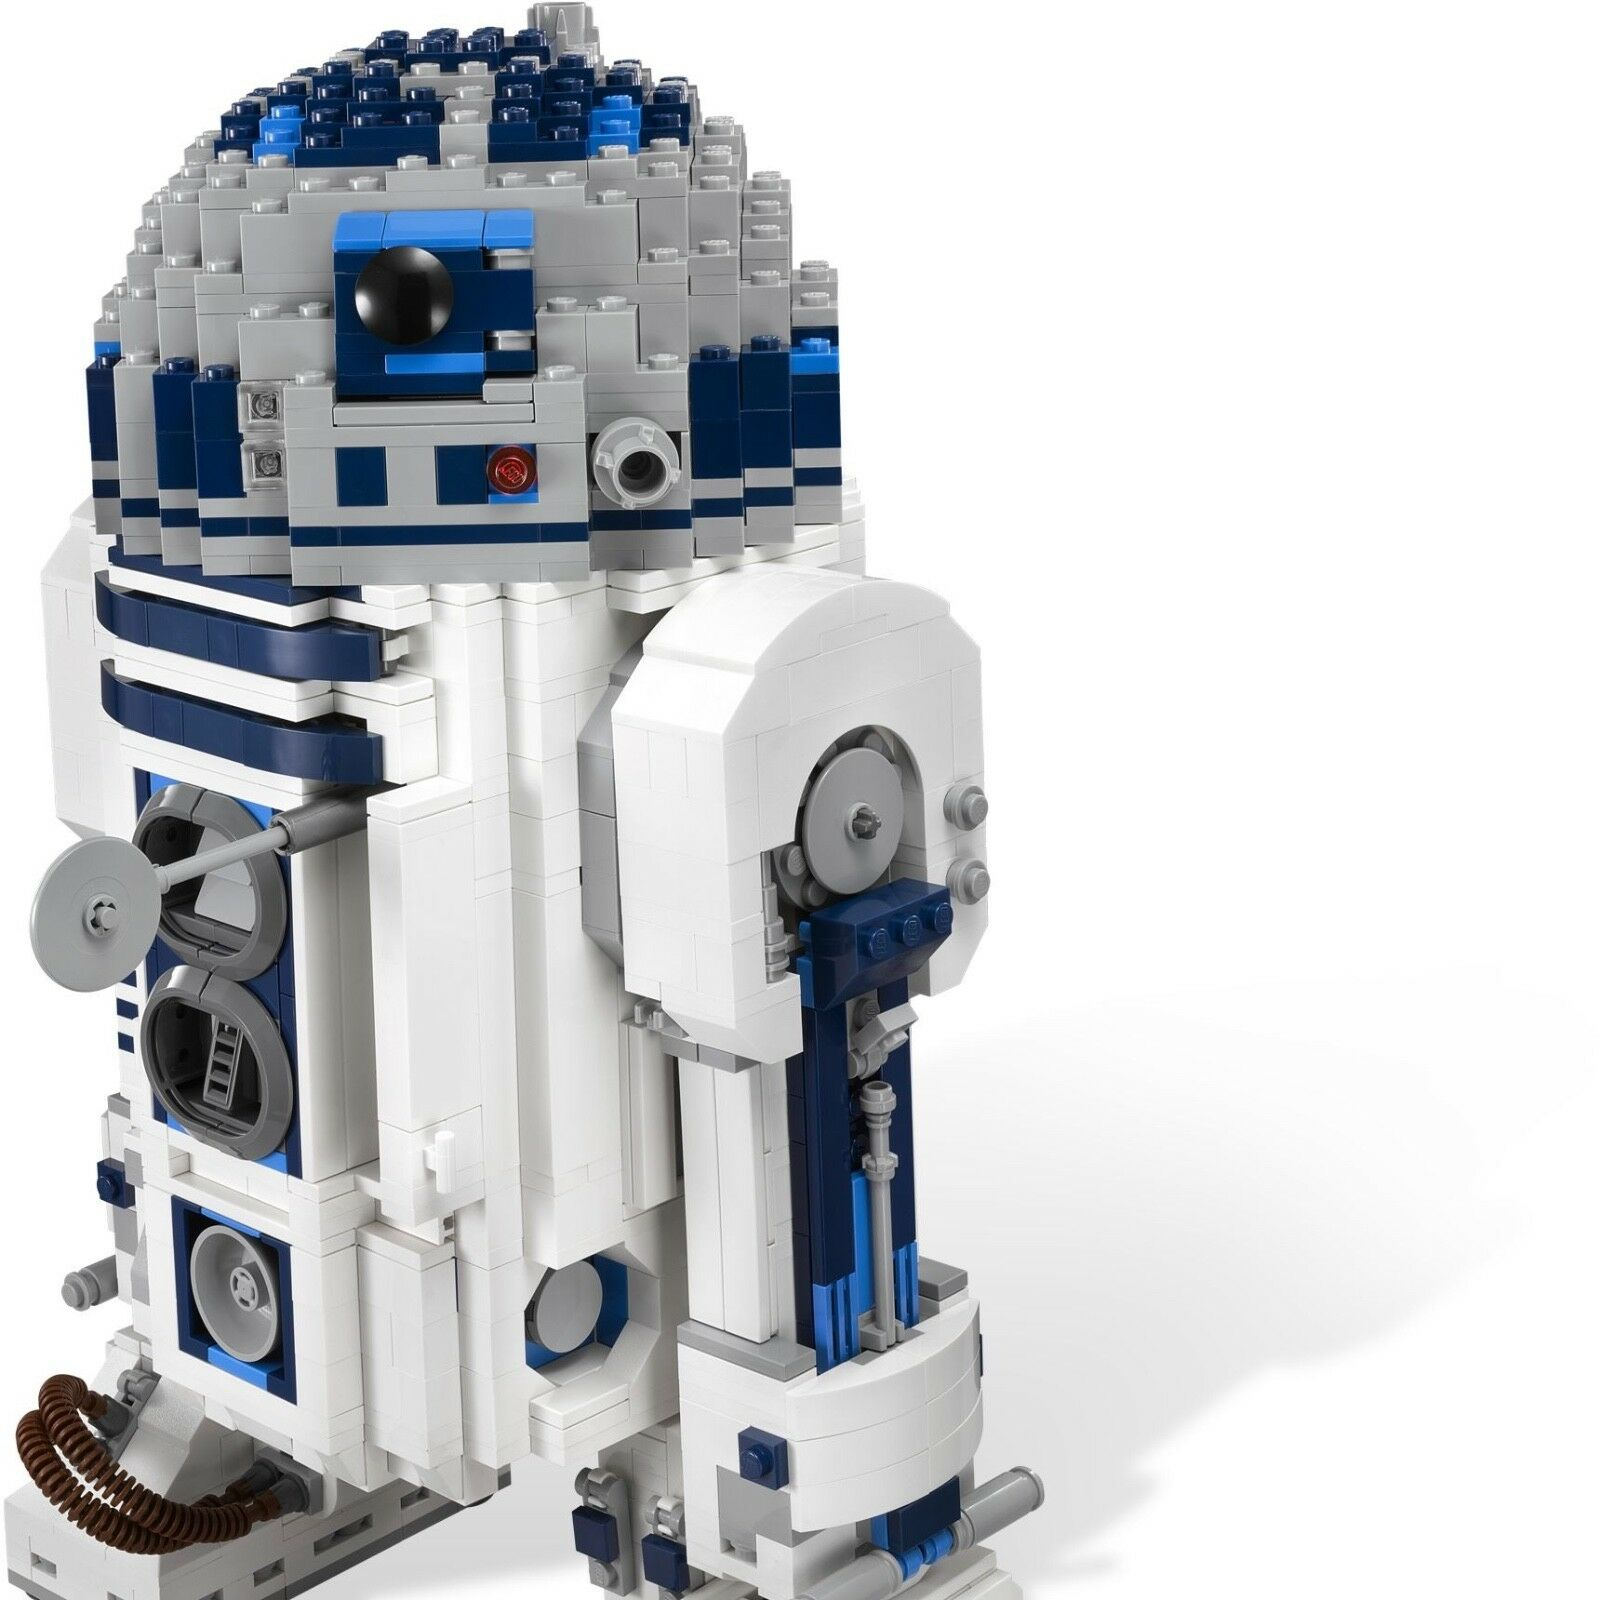 MINT New Sealed LEGO Star Wars R2-D2 2012 10225 10225 10225 Discontinued Rare b6151a